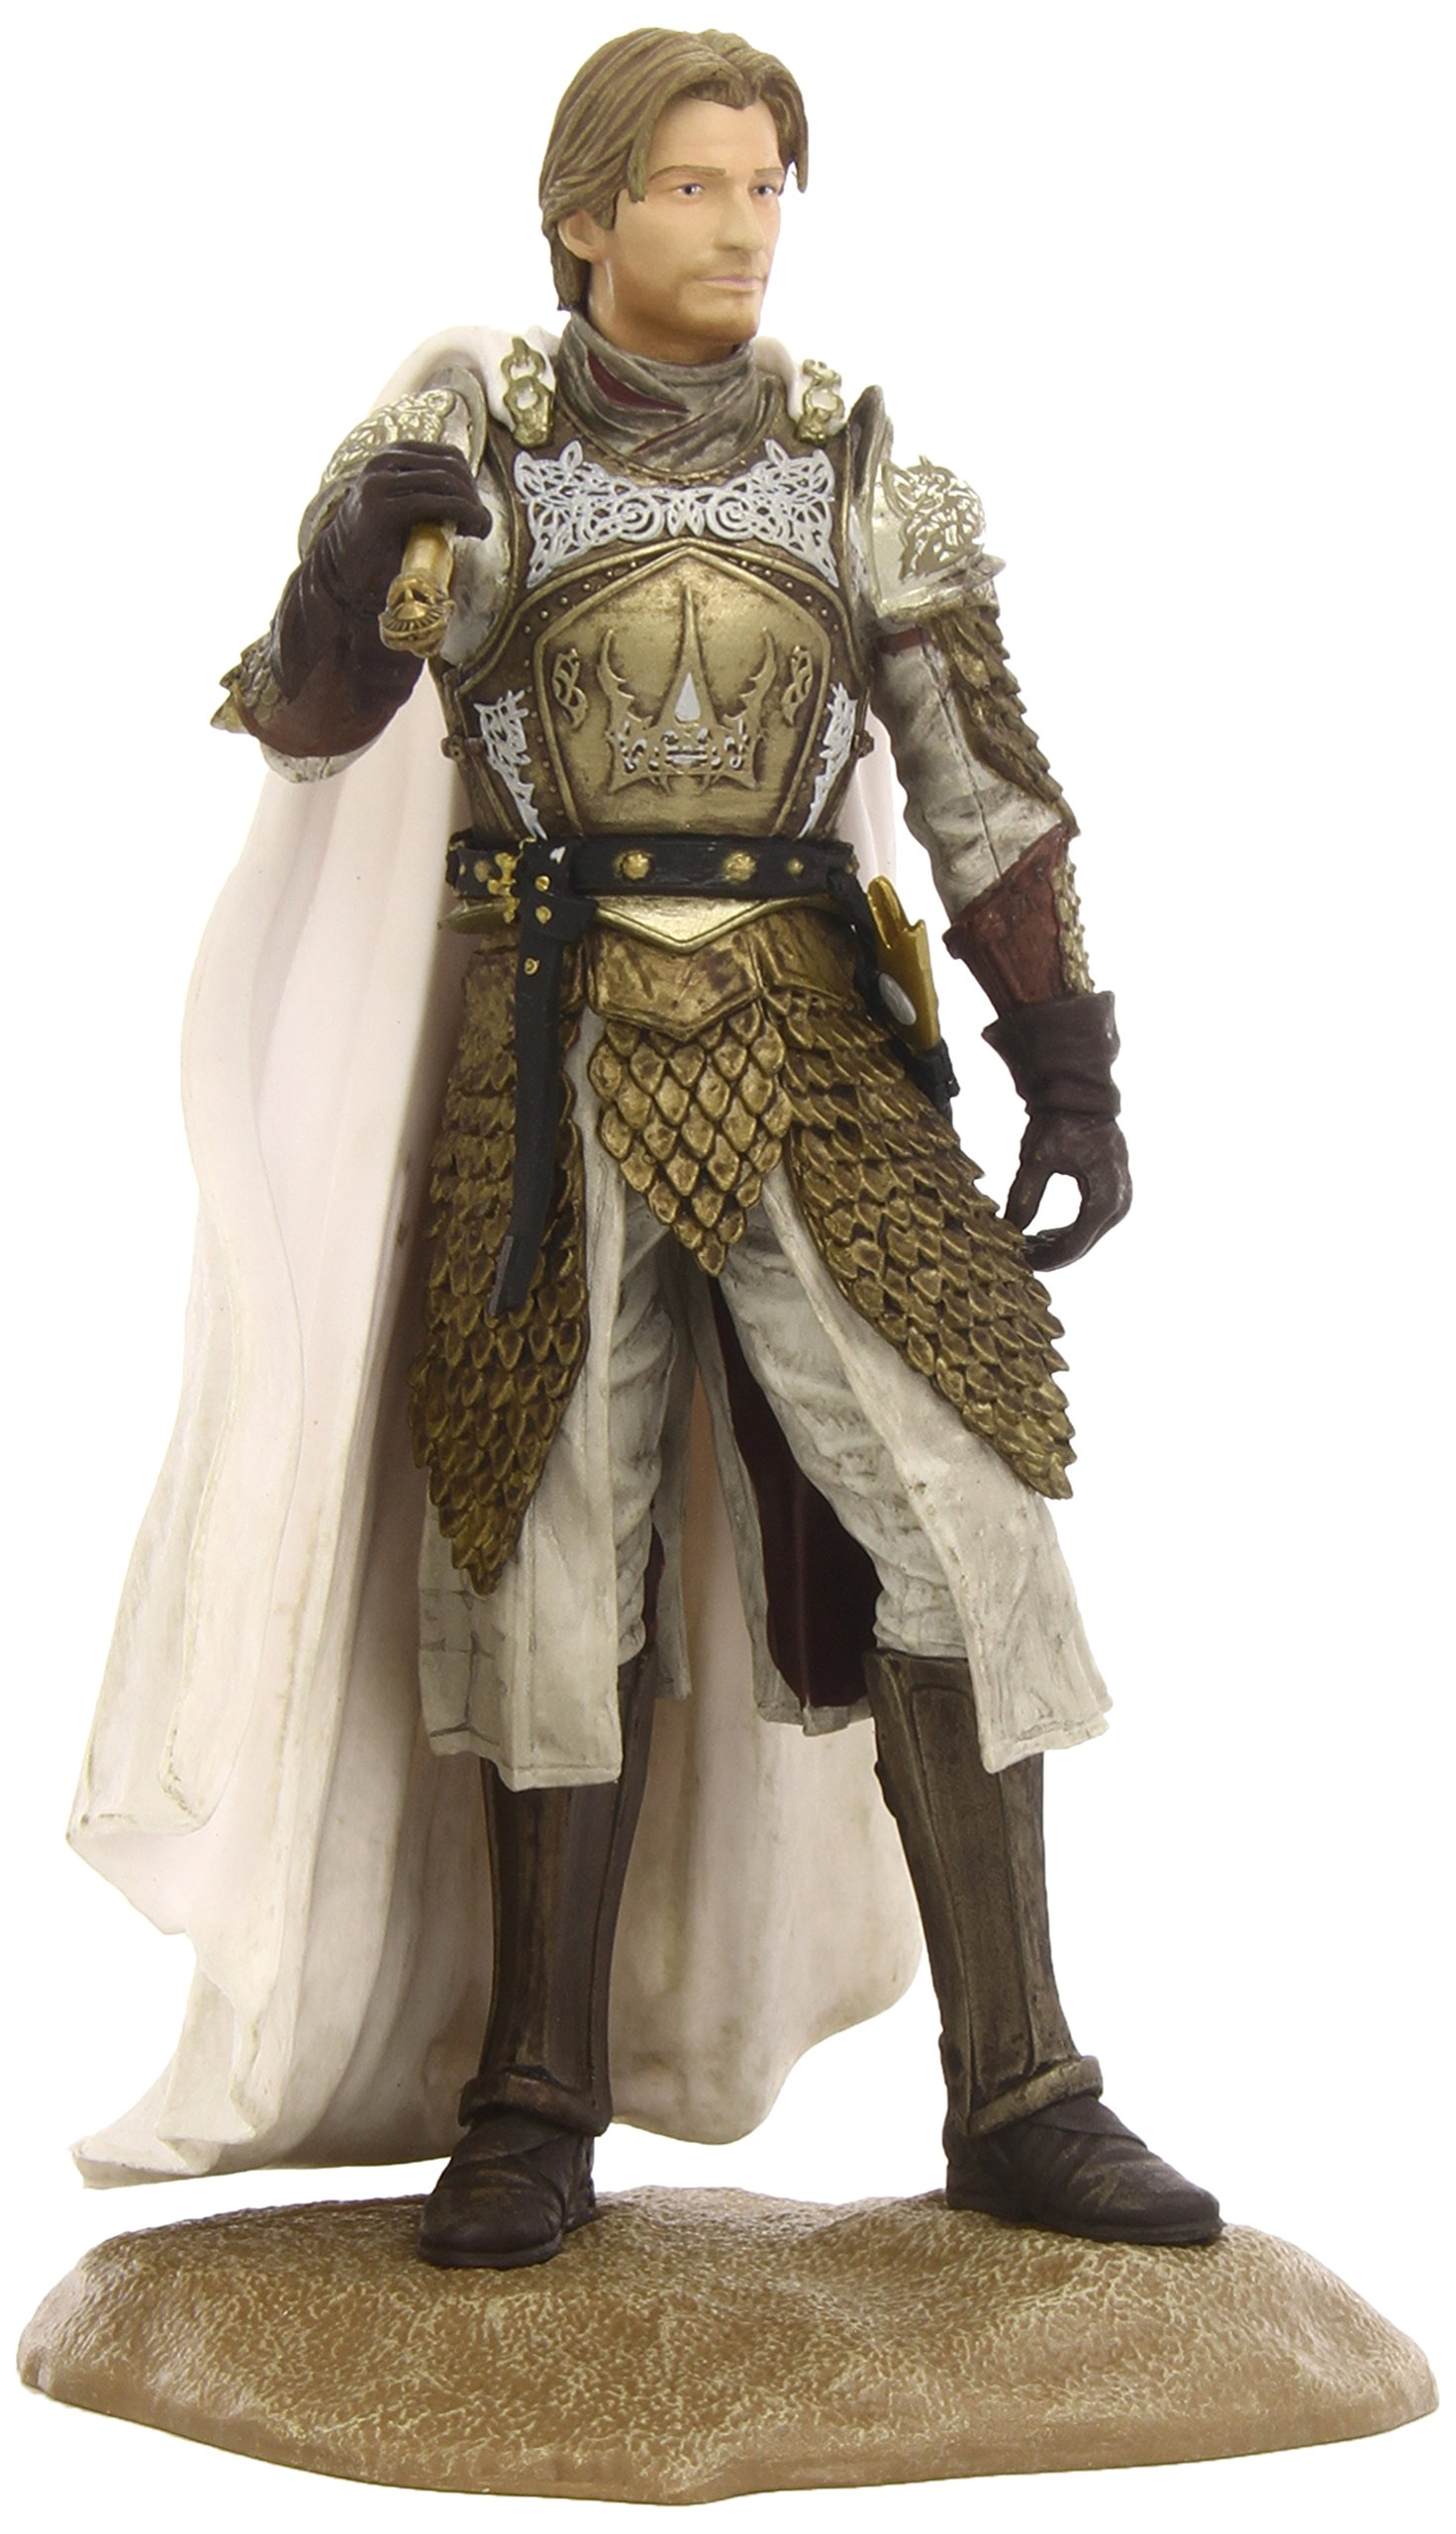 Dark Horse Deluxe Game of Thrones: Jaime Lannister Figure by Dark Horse Deluxe (Image #1)